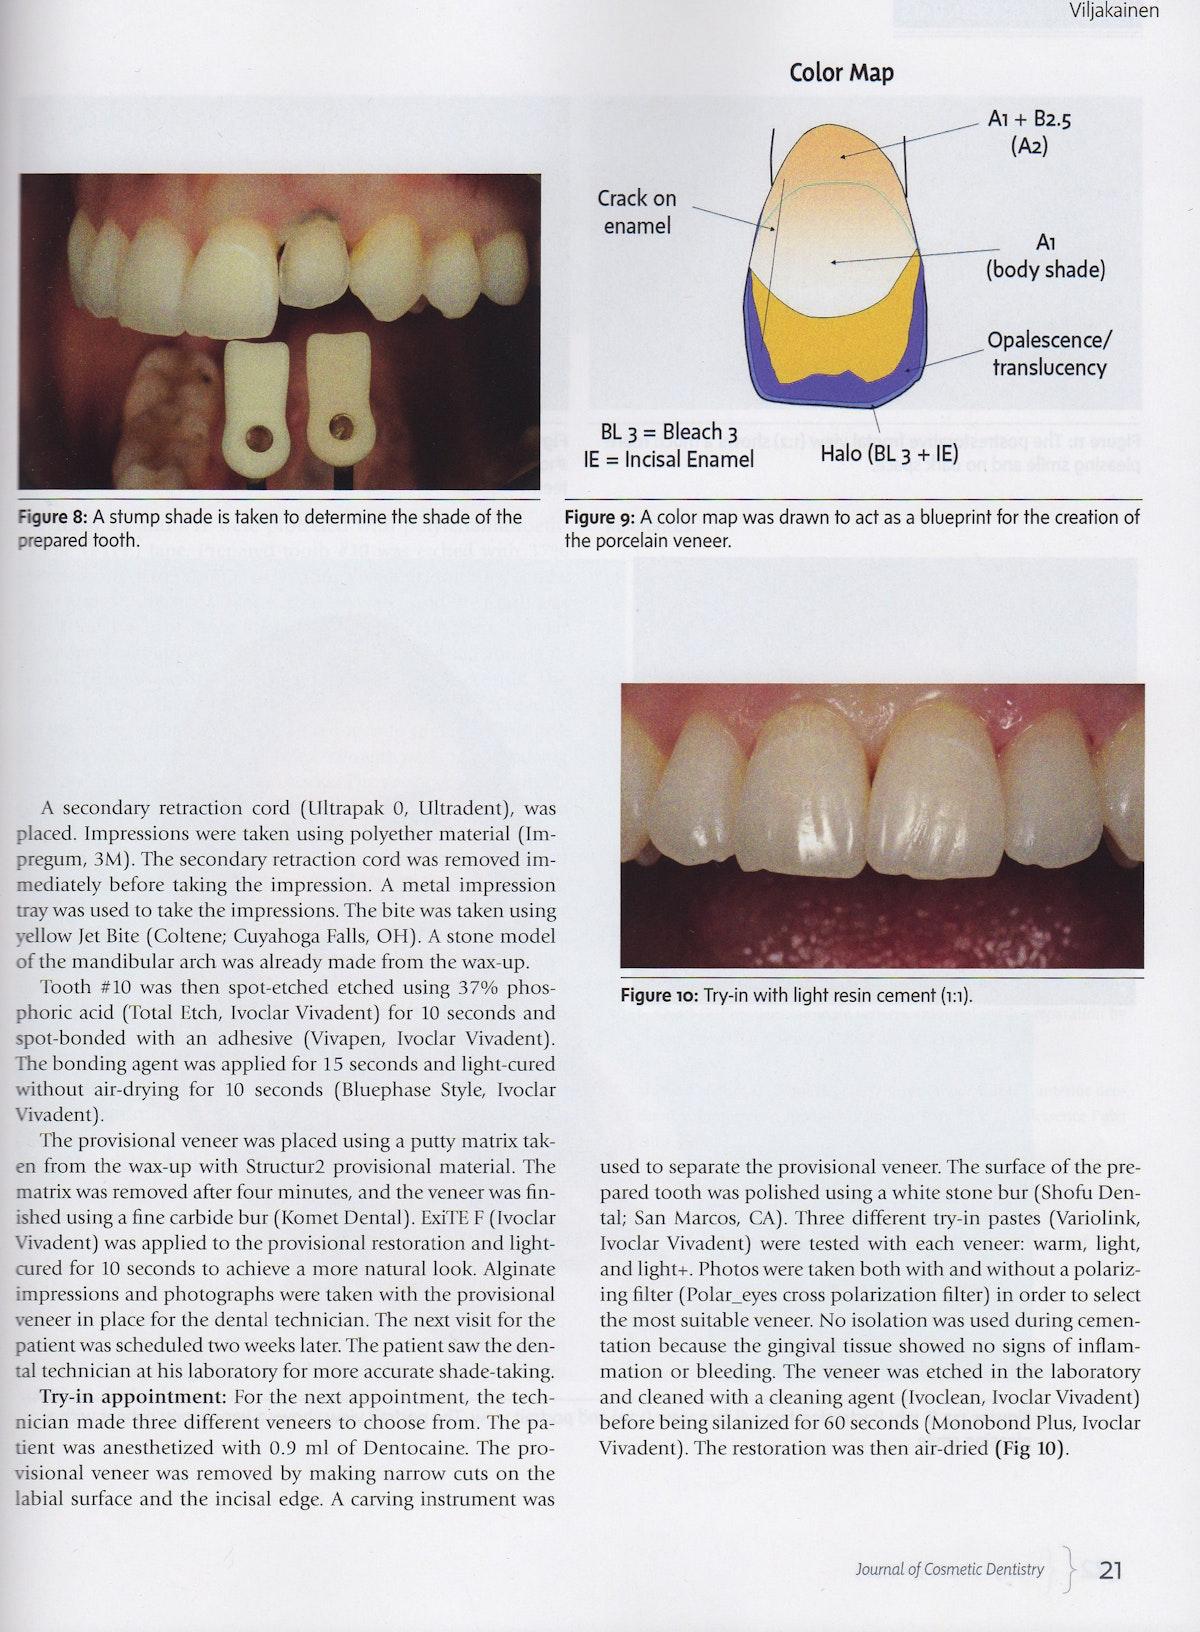 Journal of Cosmetic Dentisry article. dr. Petteri Viljakainen. Keraaminen kuori. Ceramic veneer. Invisalign.